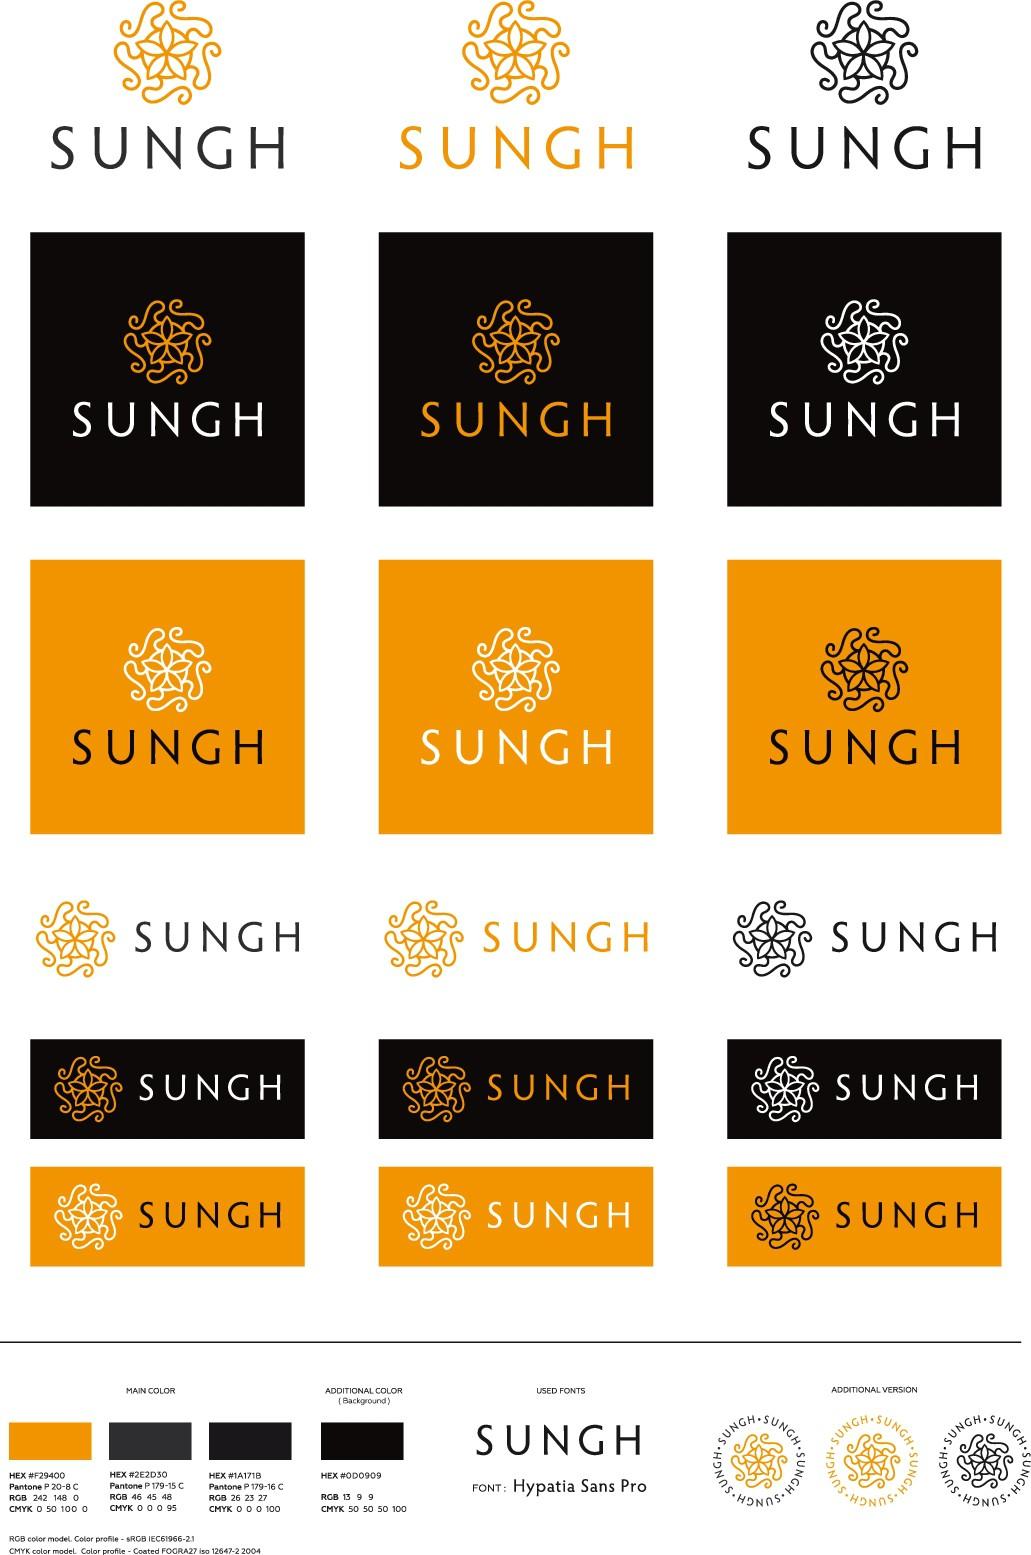 Design a community inclusive logo for Sungh, a new Marketplace.